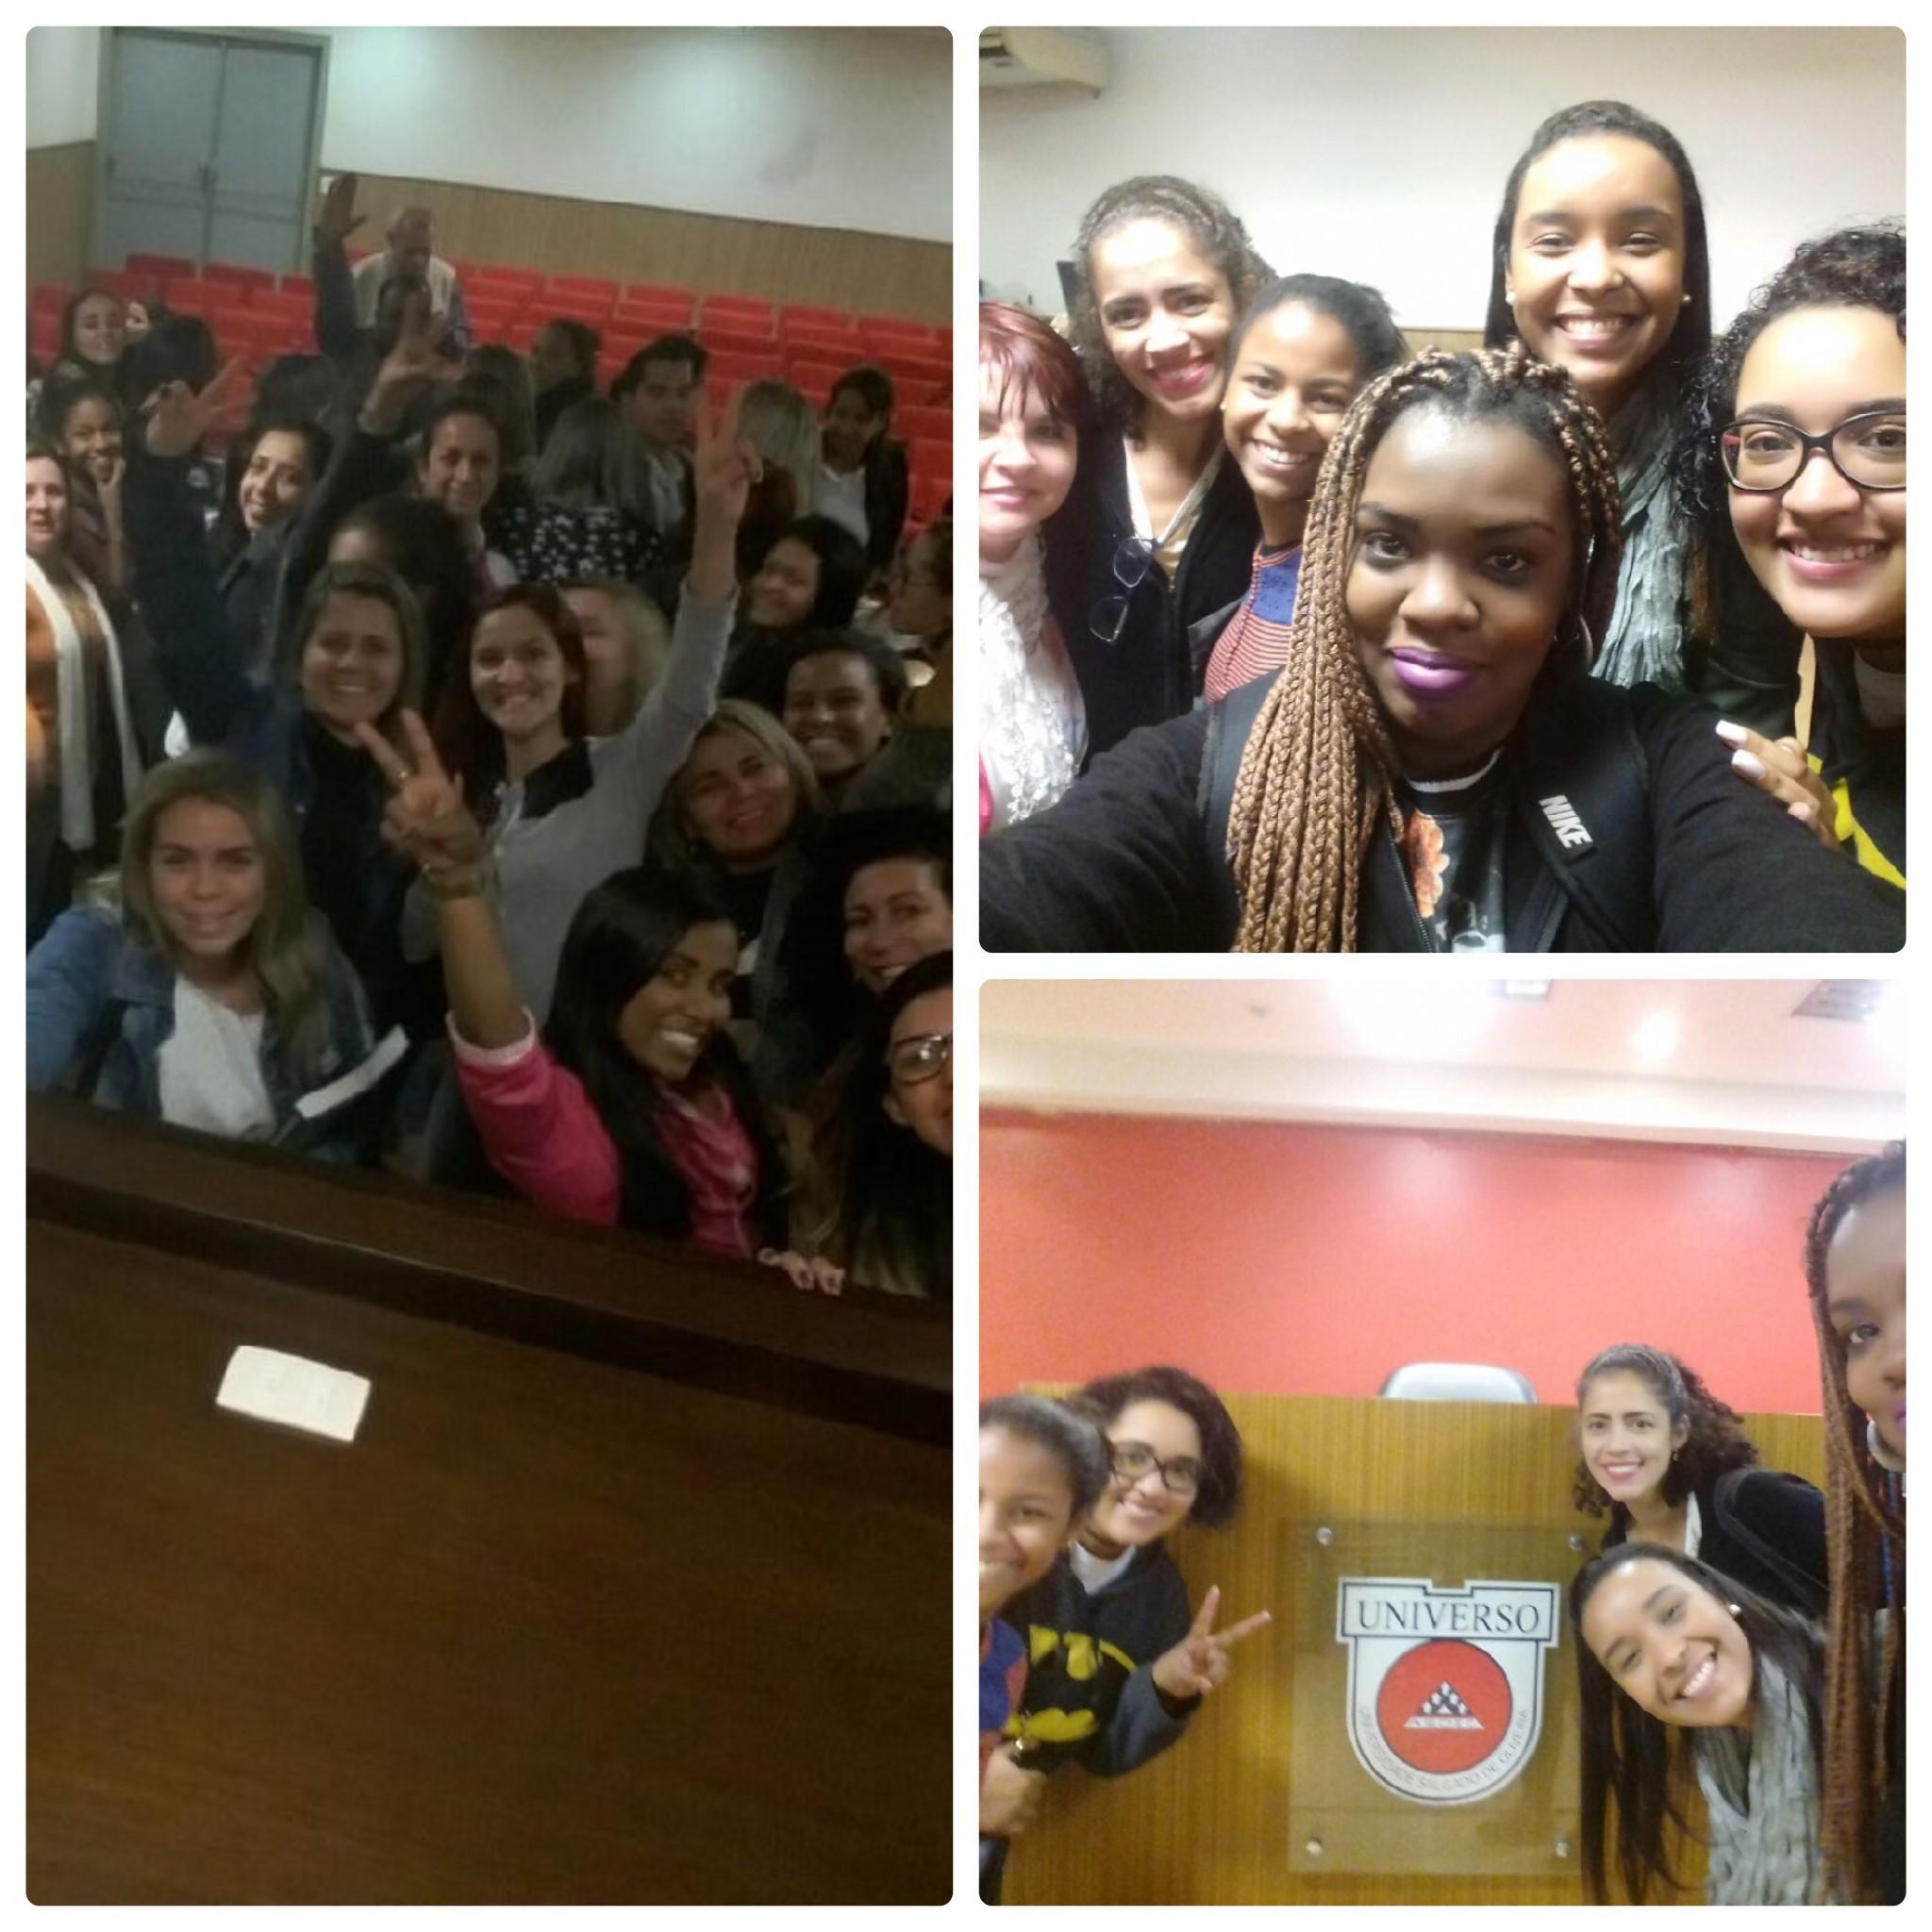 Aula Inaugural Curso de Estética -2 semestre 2016 Universidade Salgado de Oliveira =D estética cabeleireiro(a) estudante (esteticista)